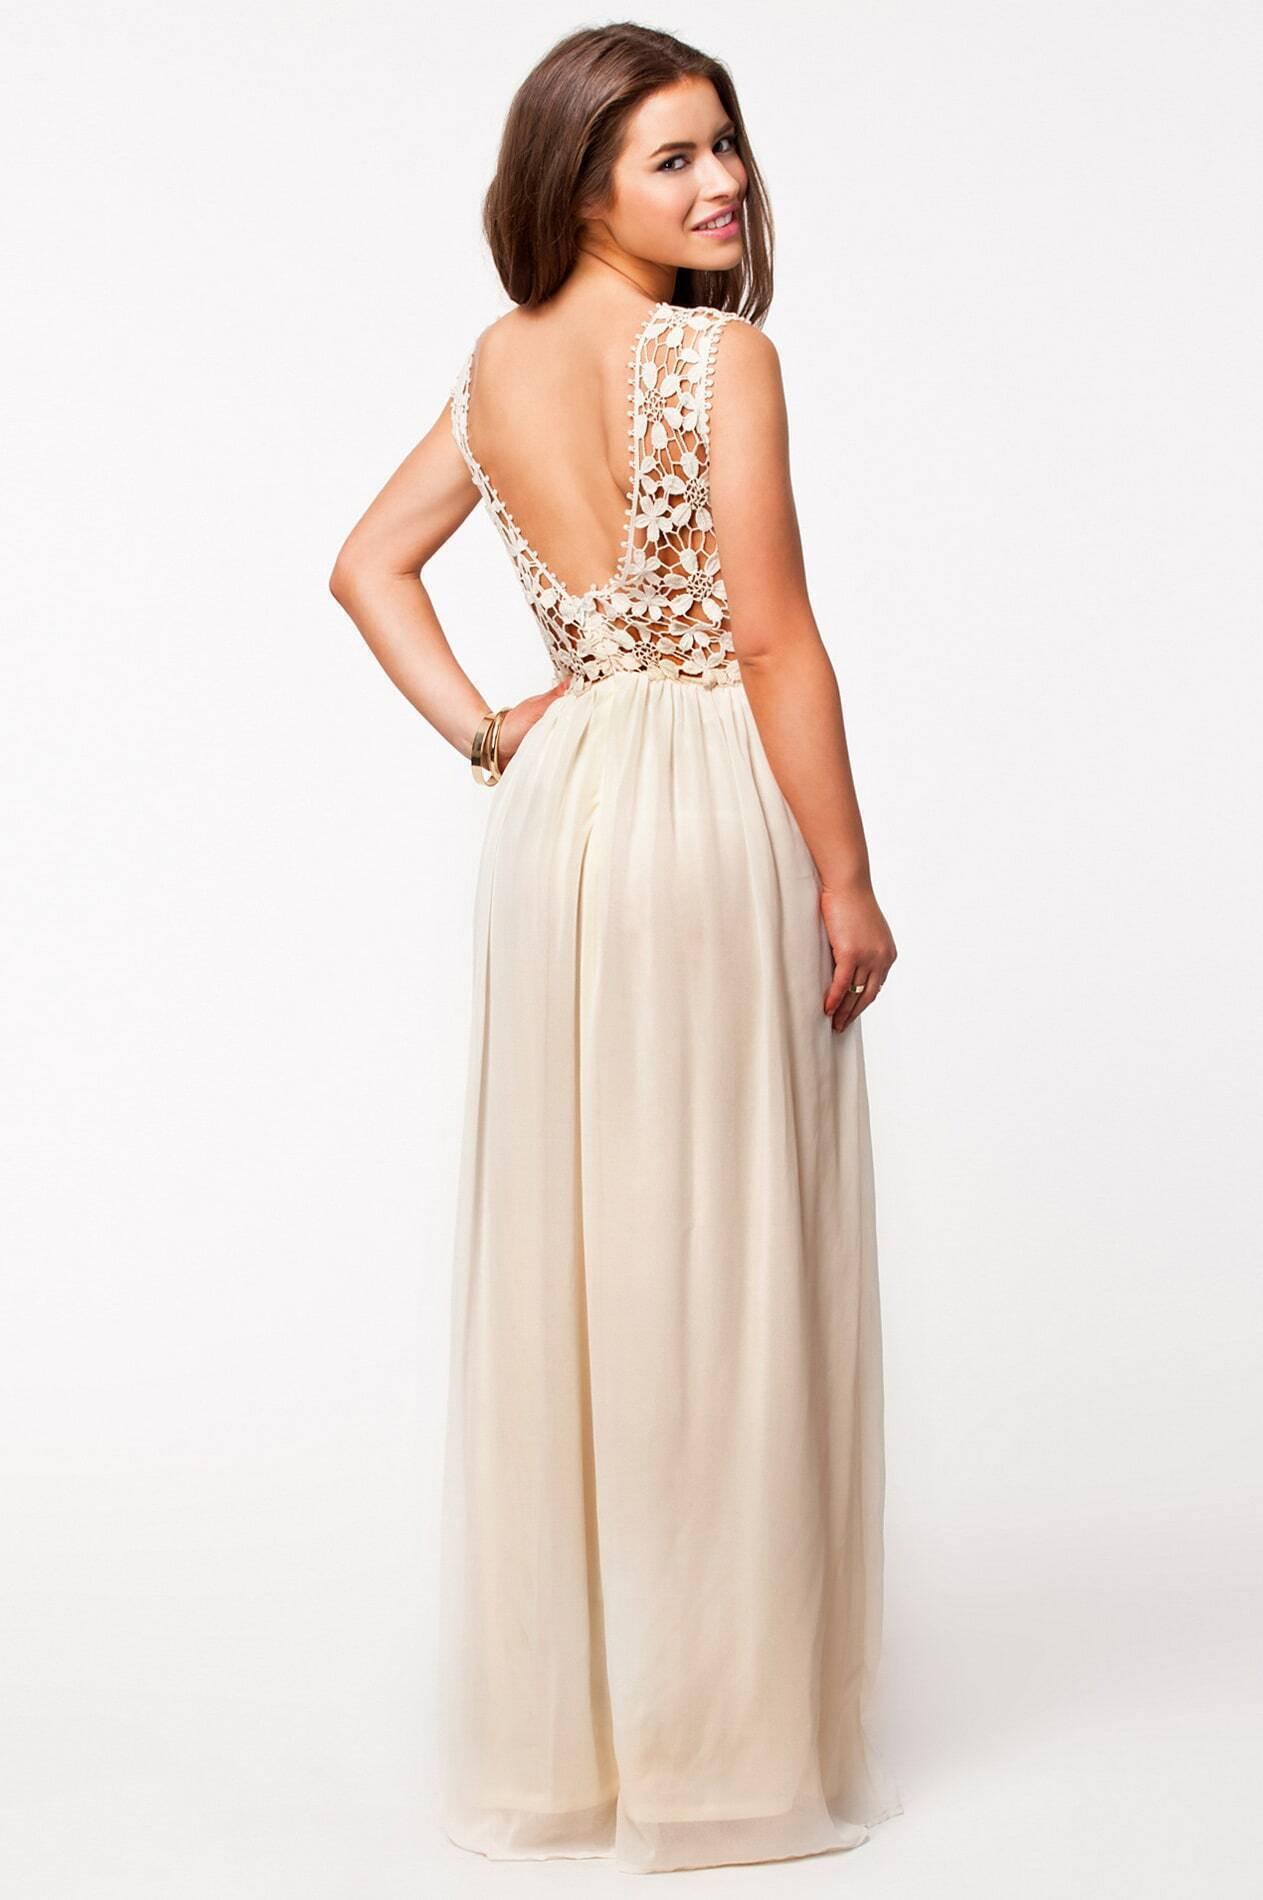 cd0ae65351c9bf Apricot Sleeveless Floral Crochet Lace Ball Maxi Dress EmmaCloth ...